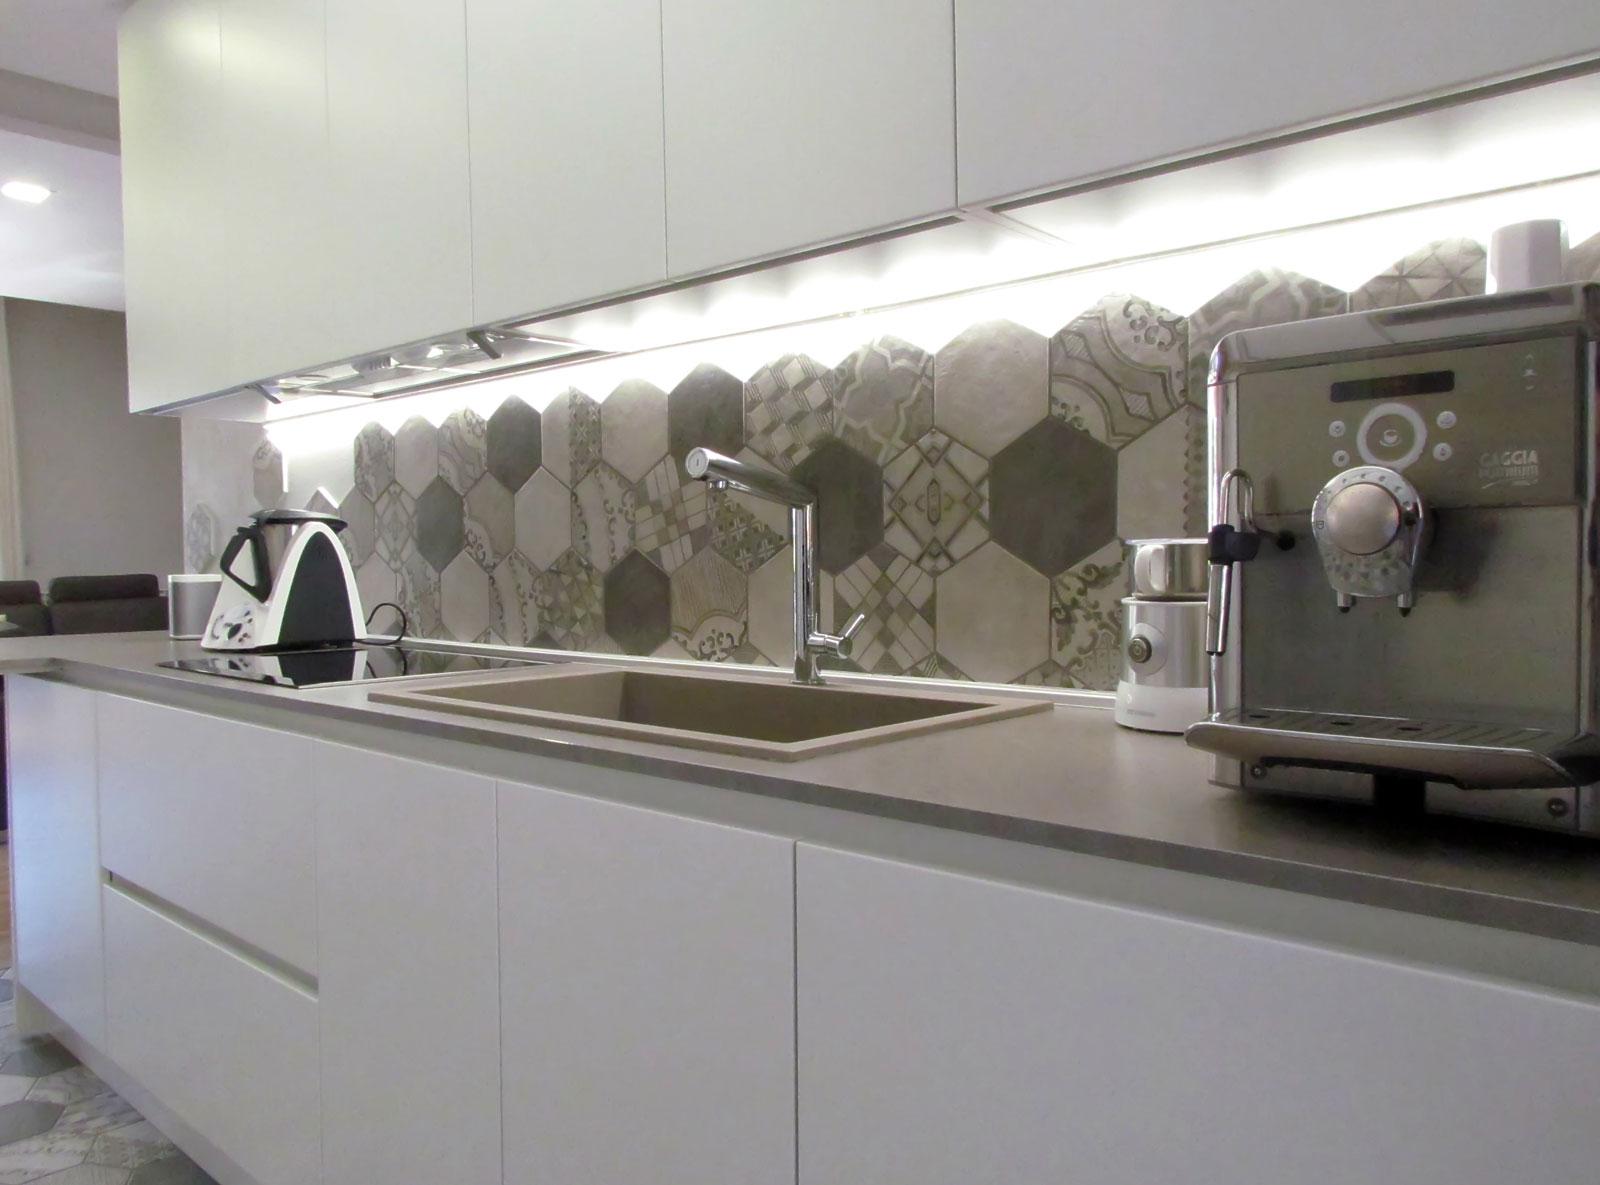 Piastrelle cucina esagonali piastrelle esagonali e cementine da